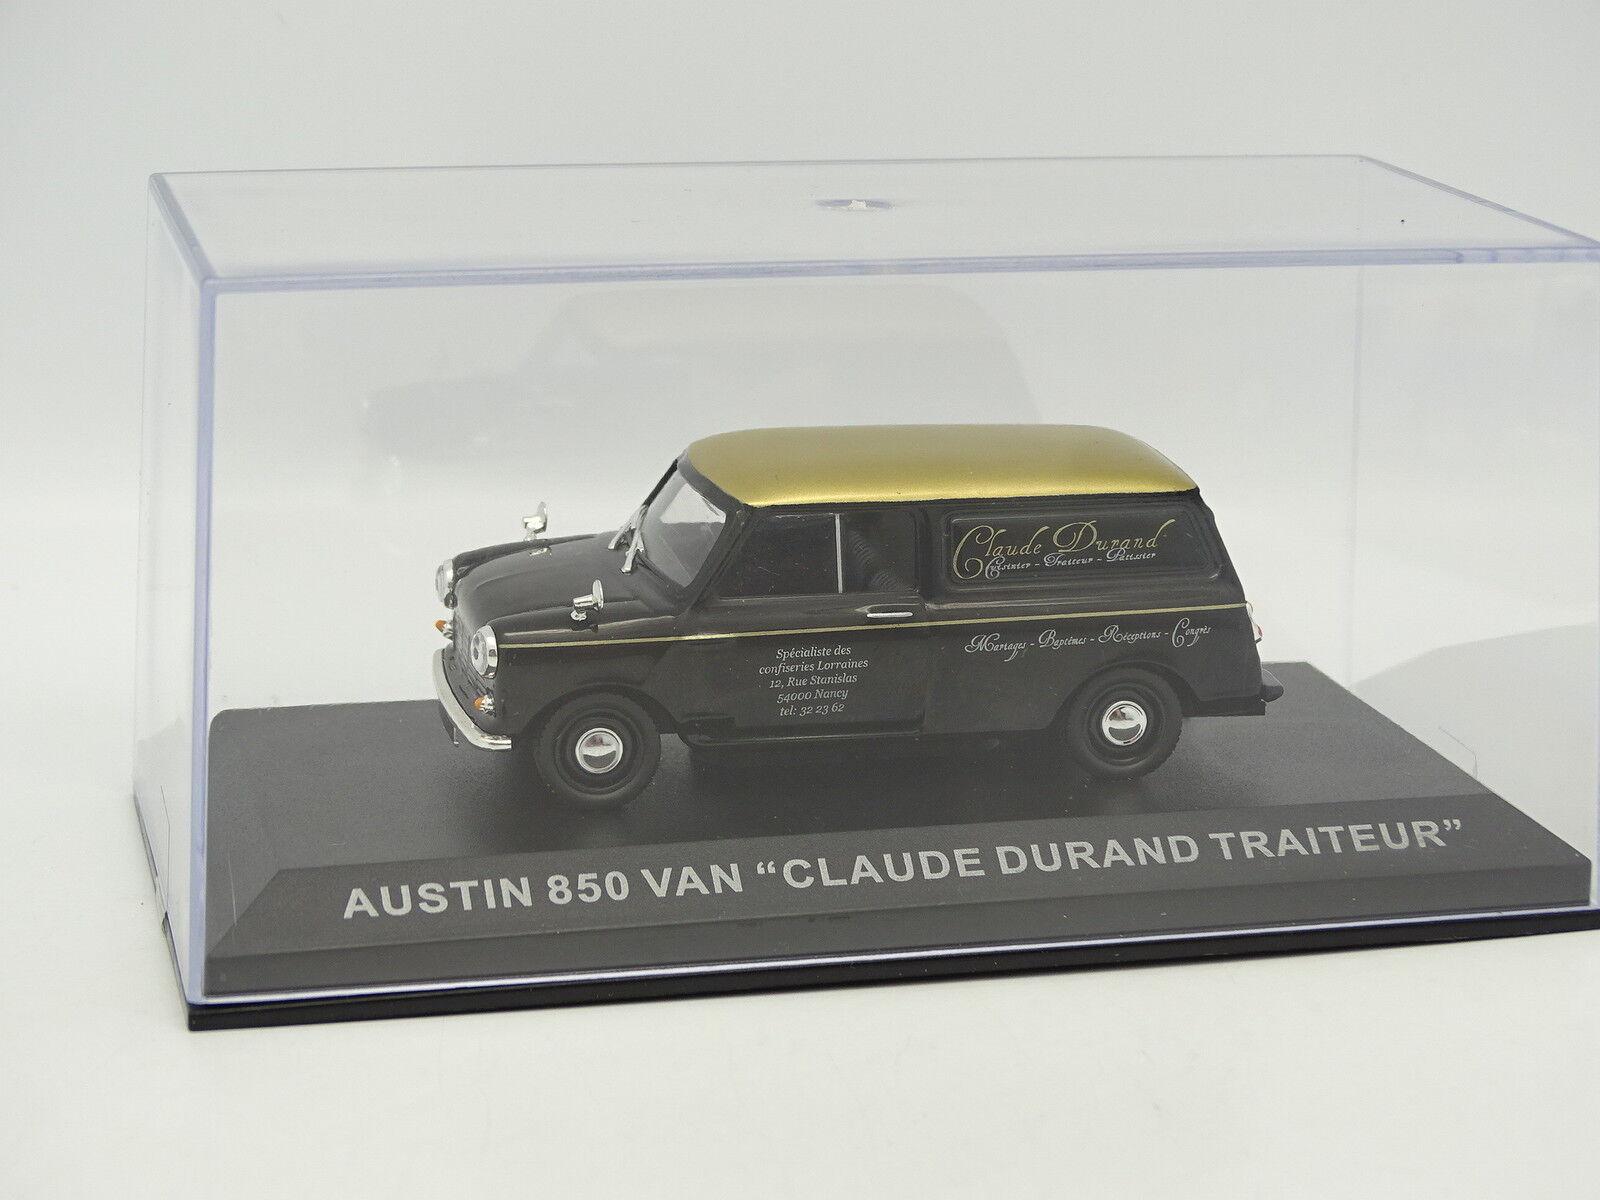 Ixo Press 1 43 - Austin Mini 850 Van Claude Durand Catering